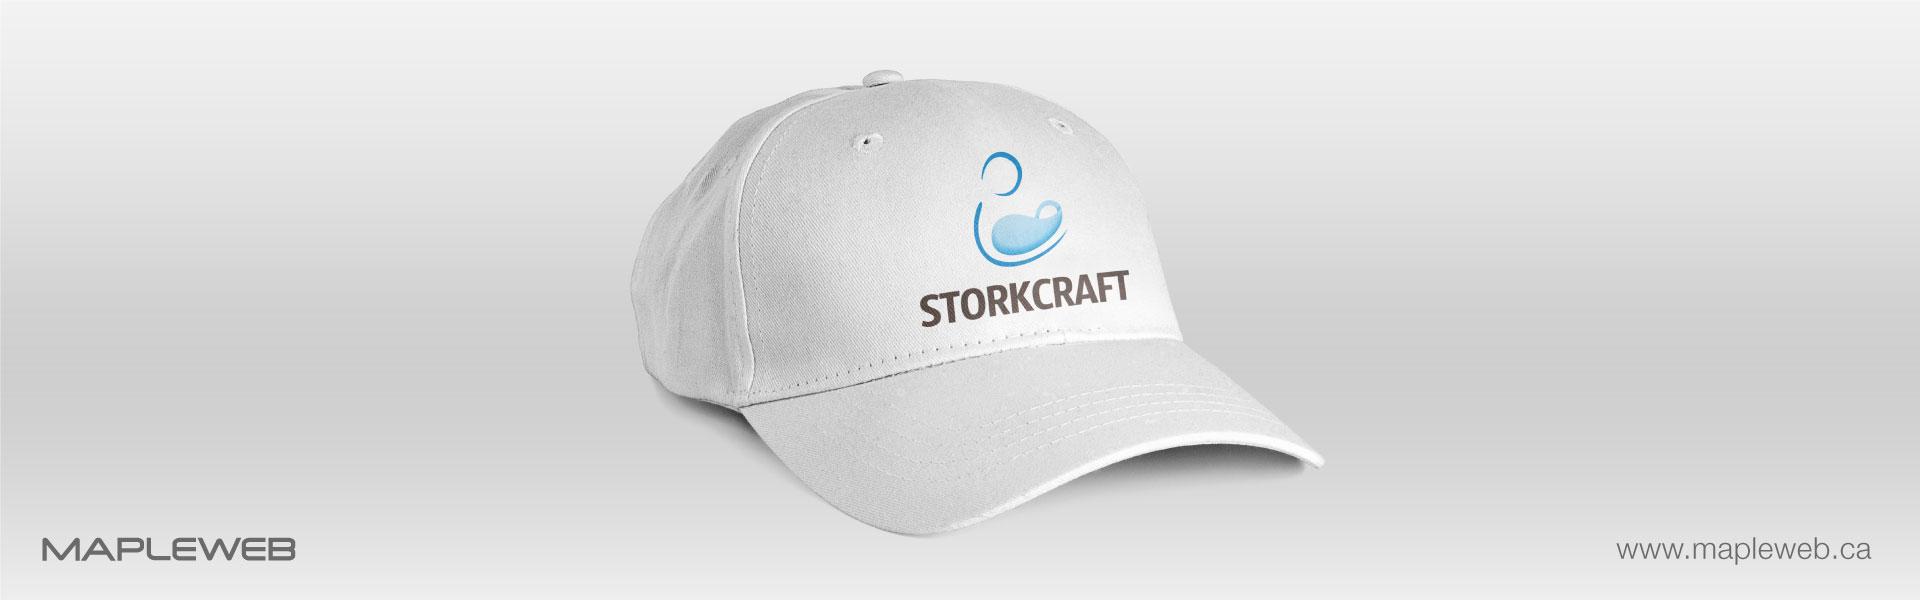 storkcraft-brand-logo-design-by-mapleweb-vancouver-canada-white-cap-mock